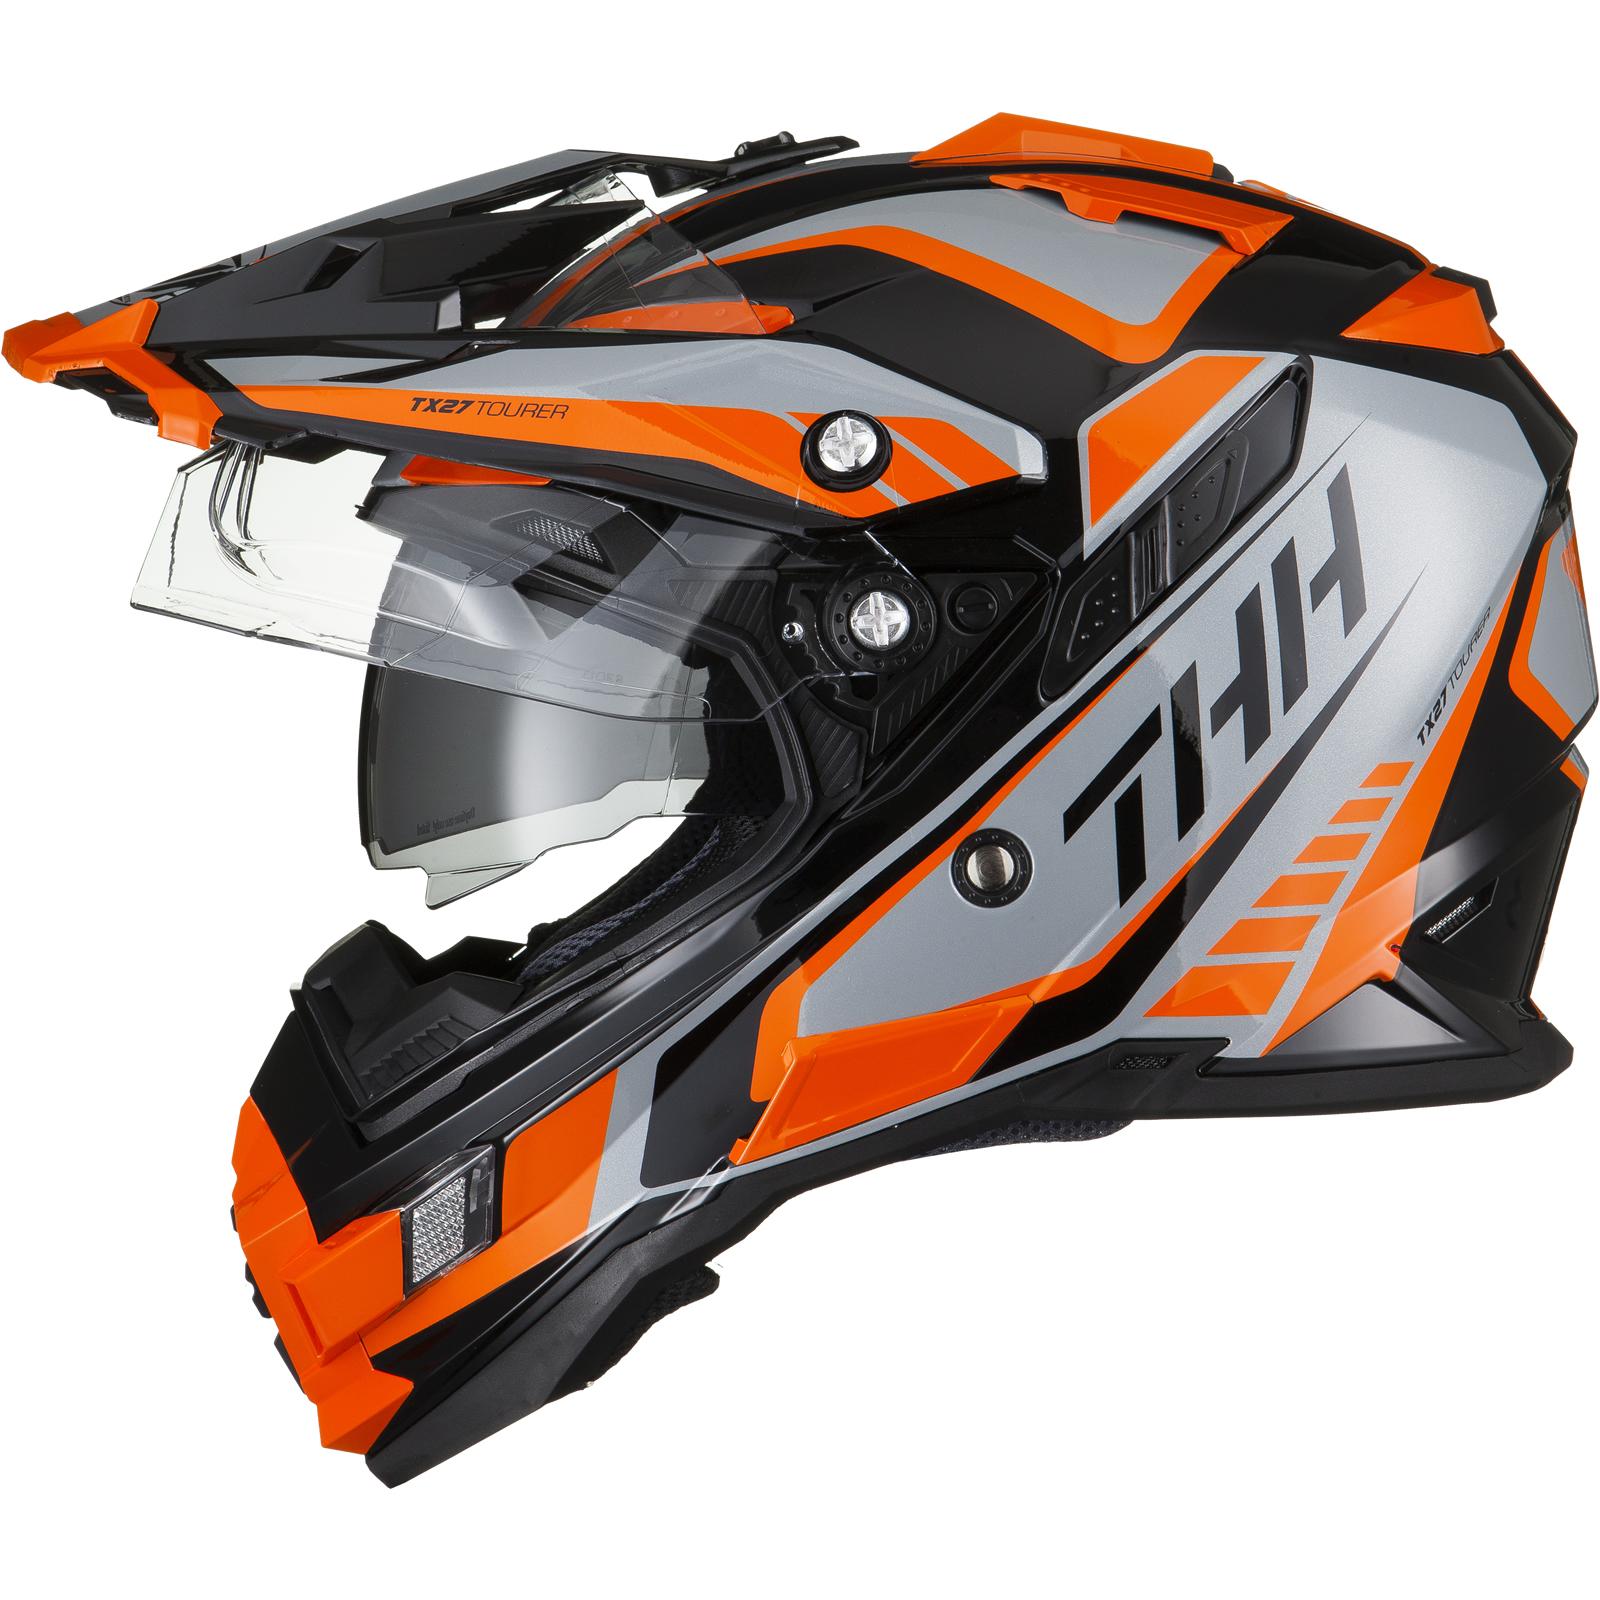 thh helmets adult motocross